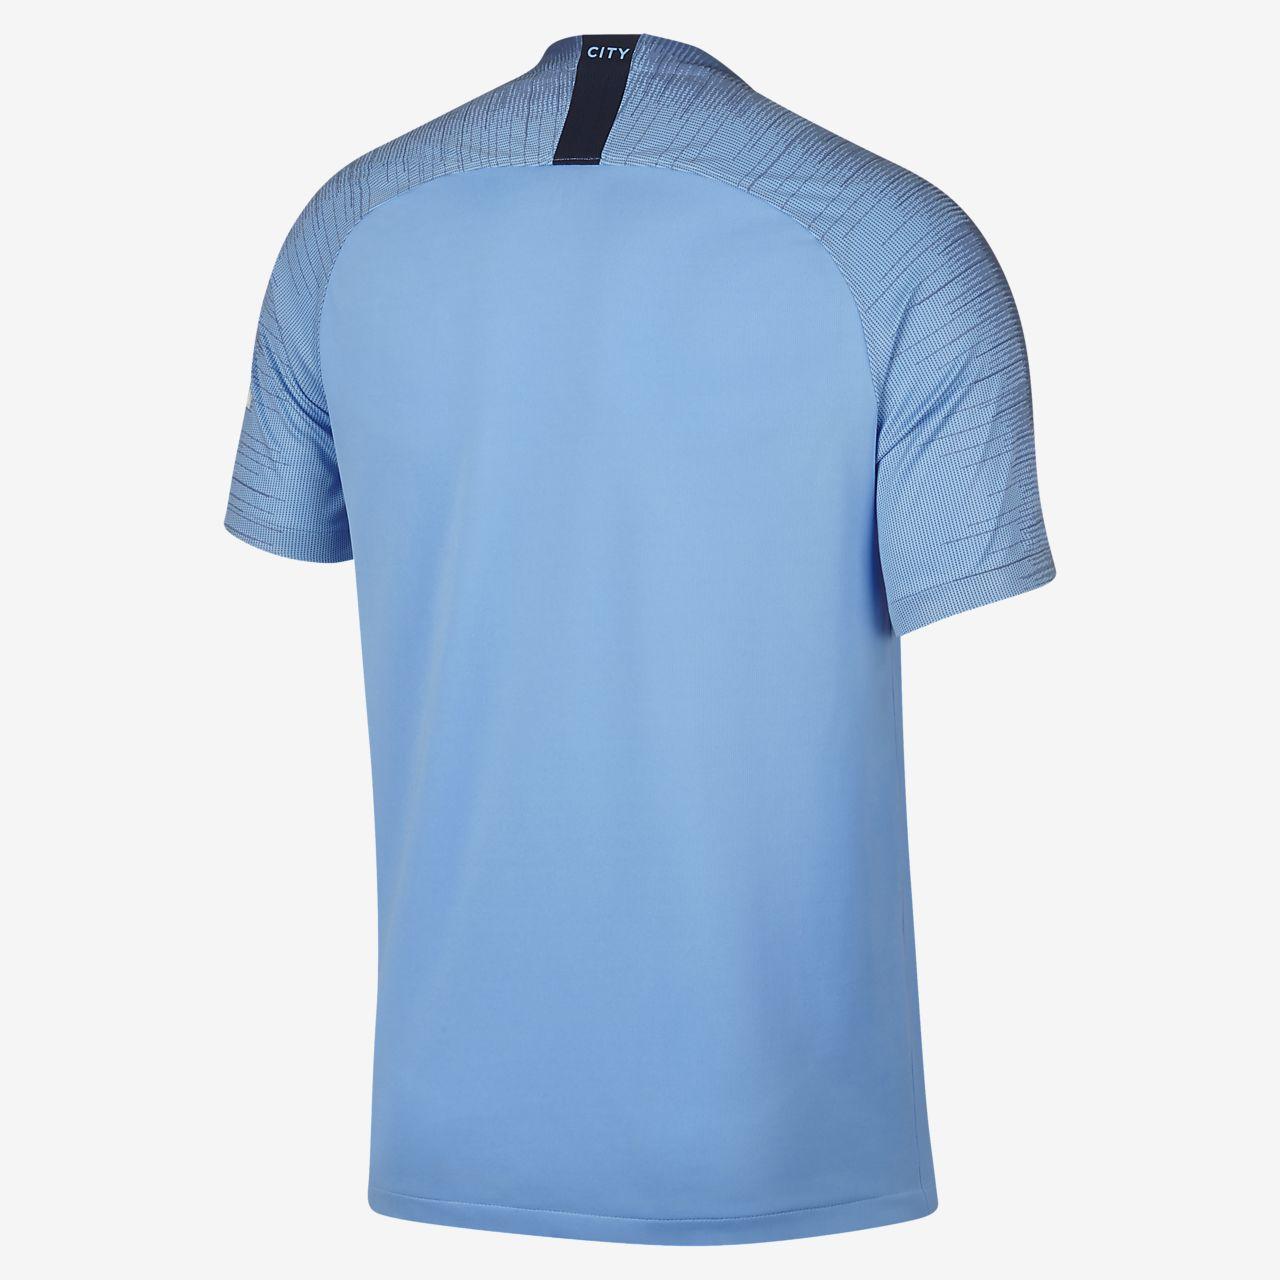 finest selection e4300 3c53e 2018/19 Manchester City FC Stadium Home Men's Football Shirt